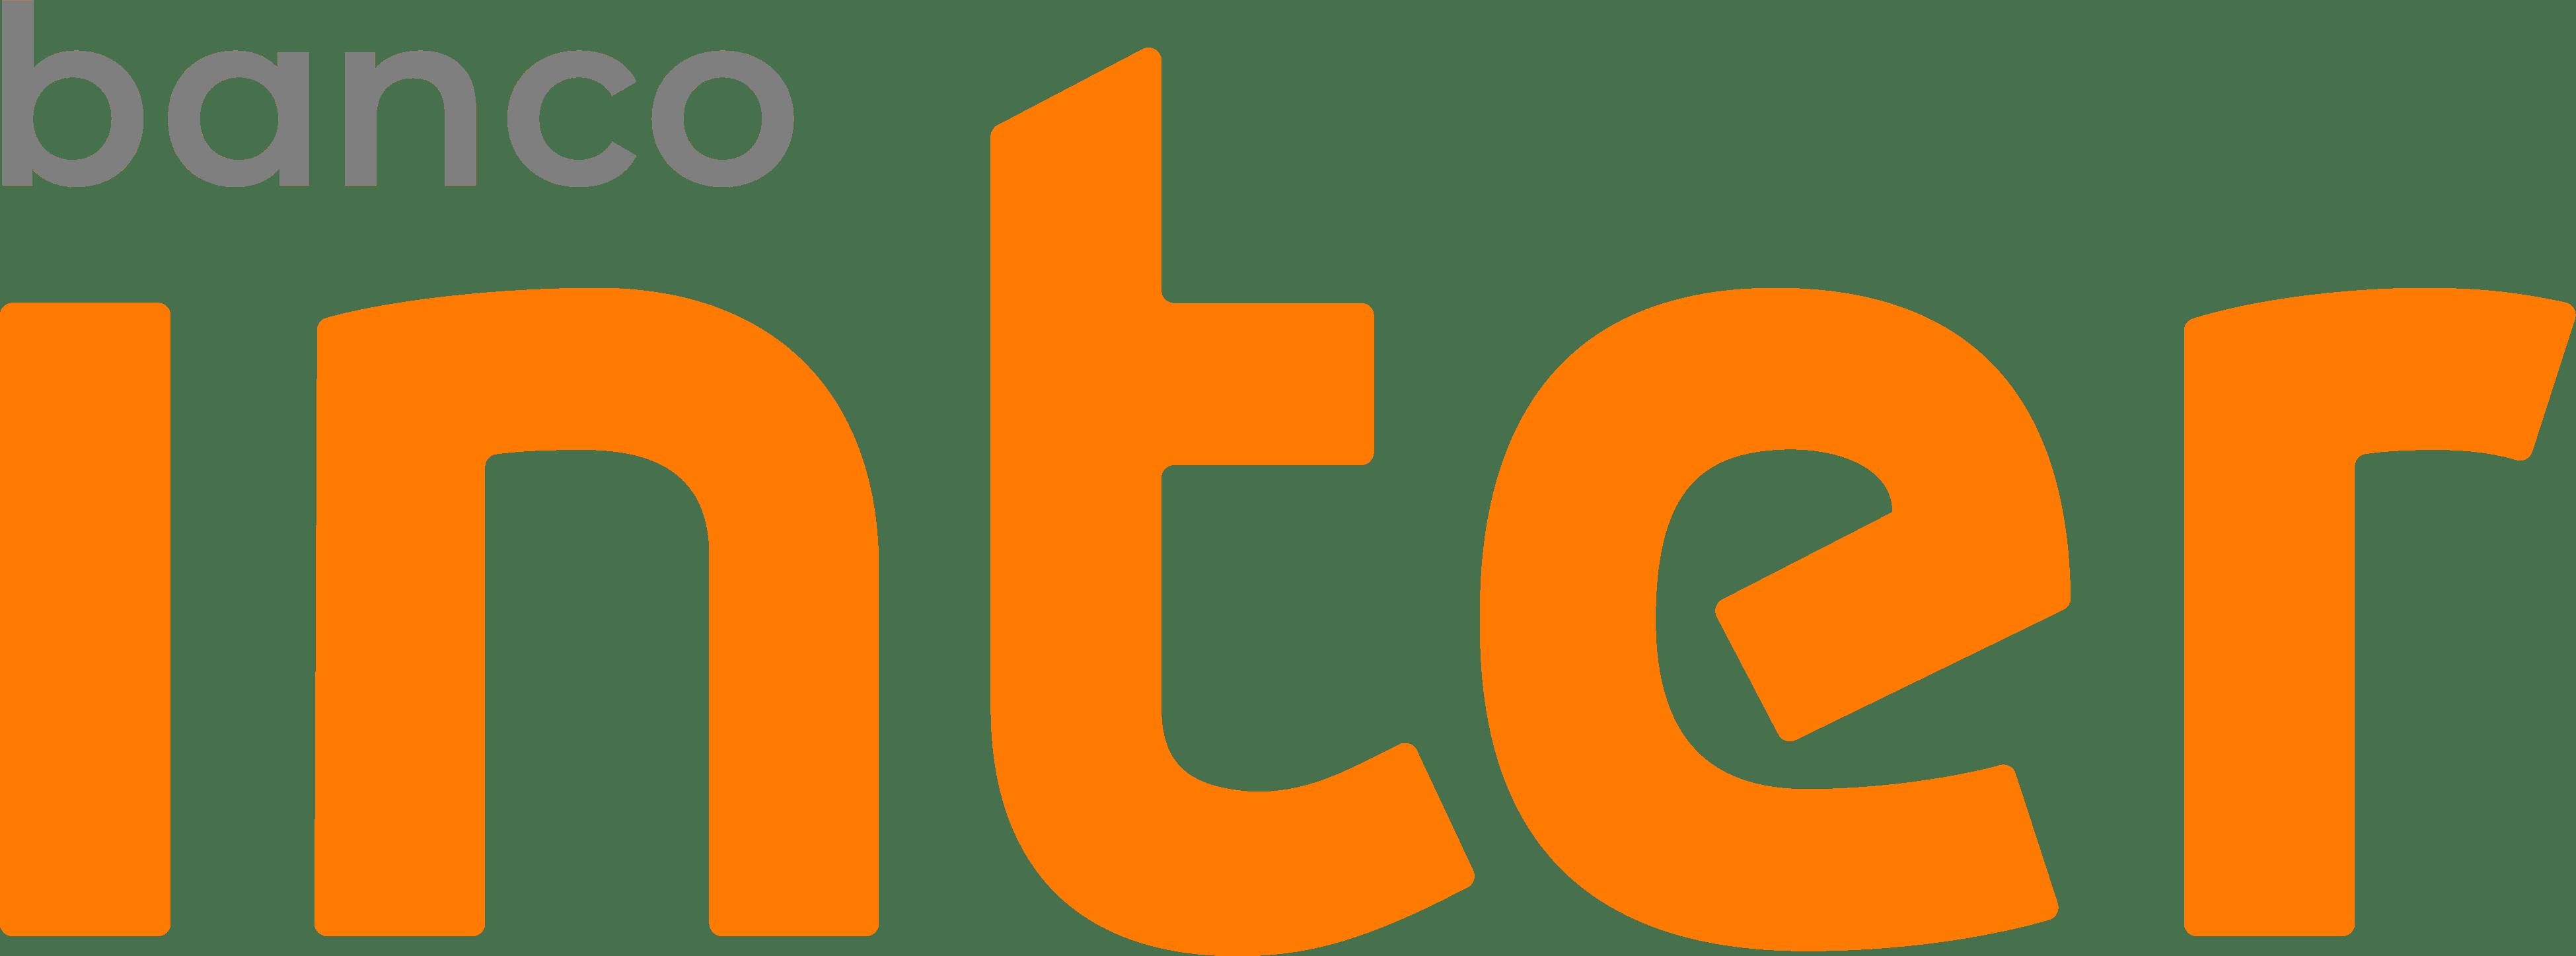 inter corretora logo